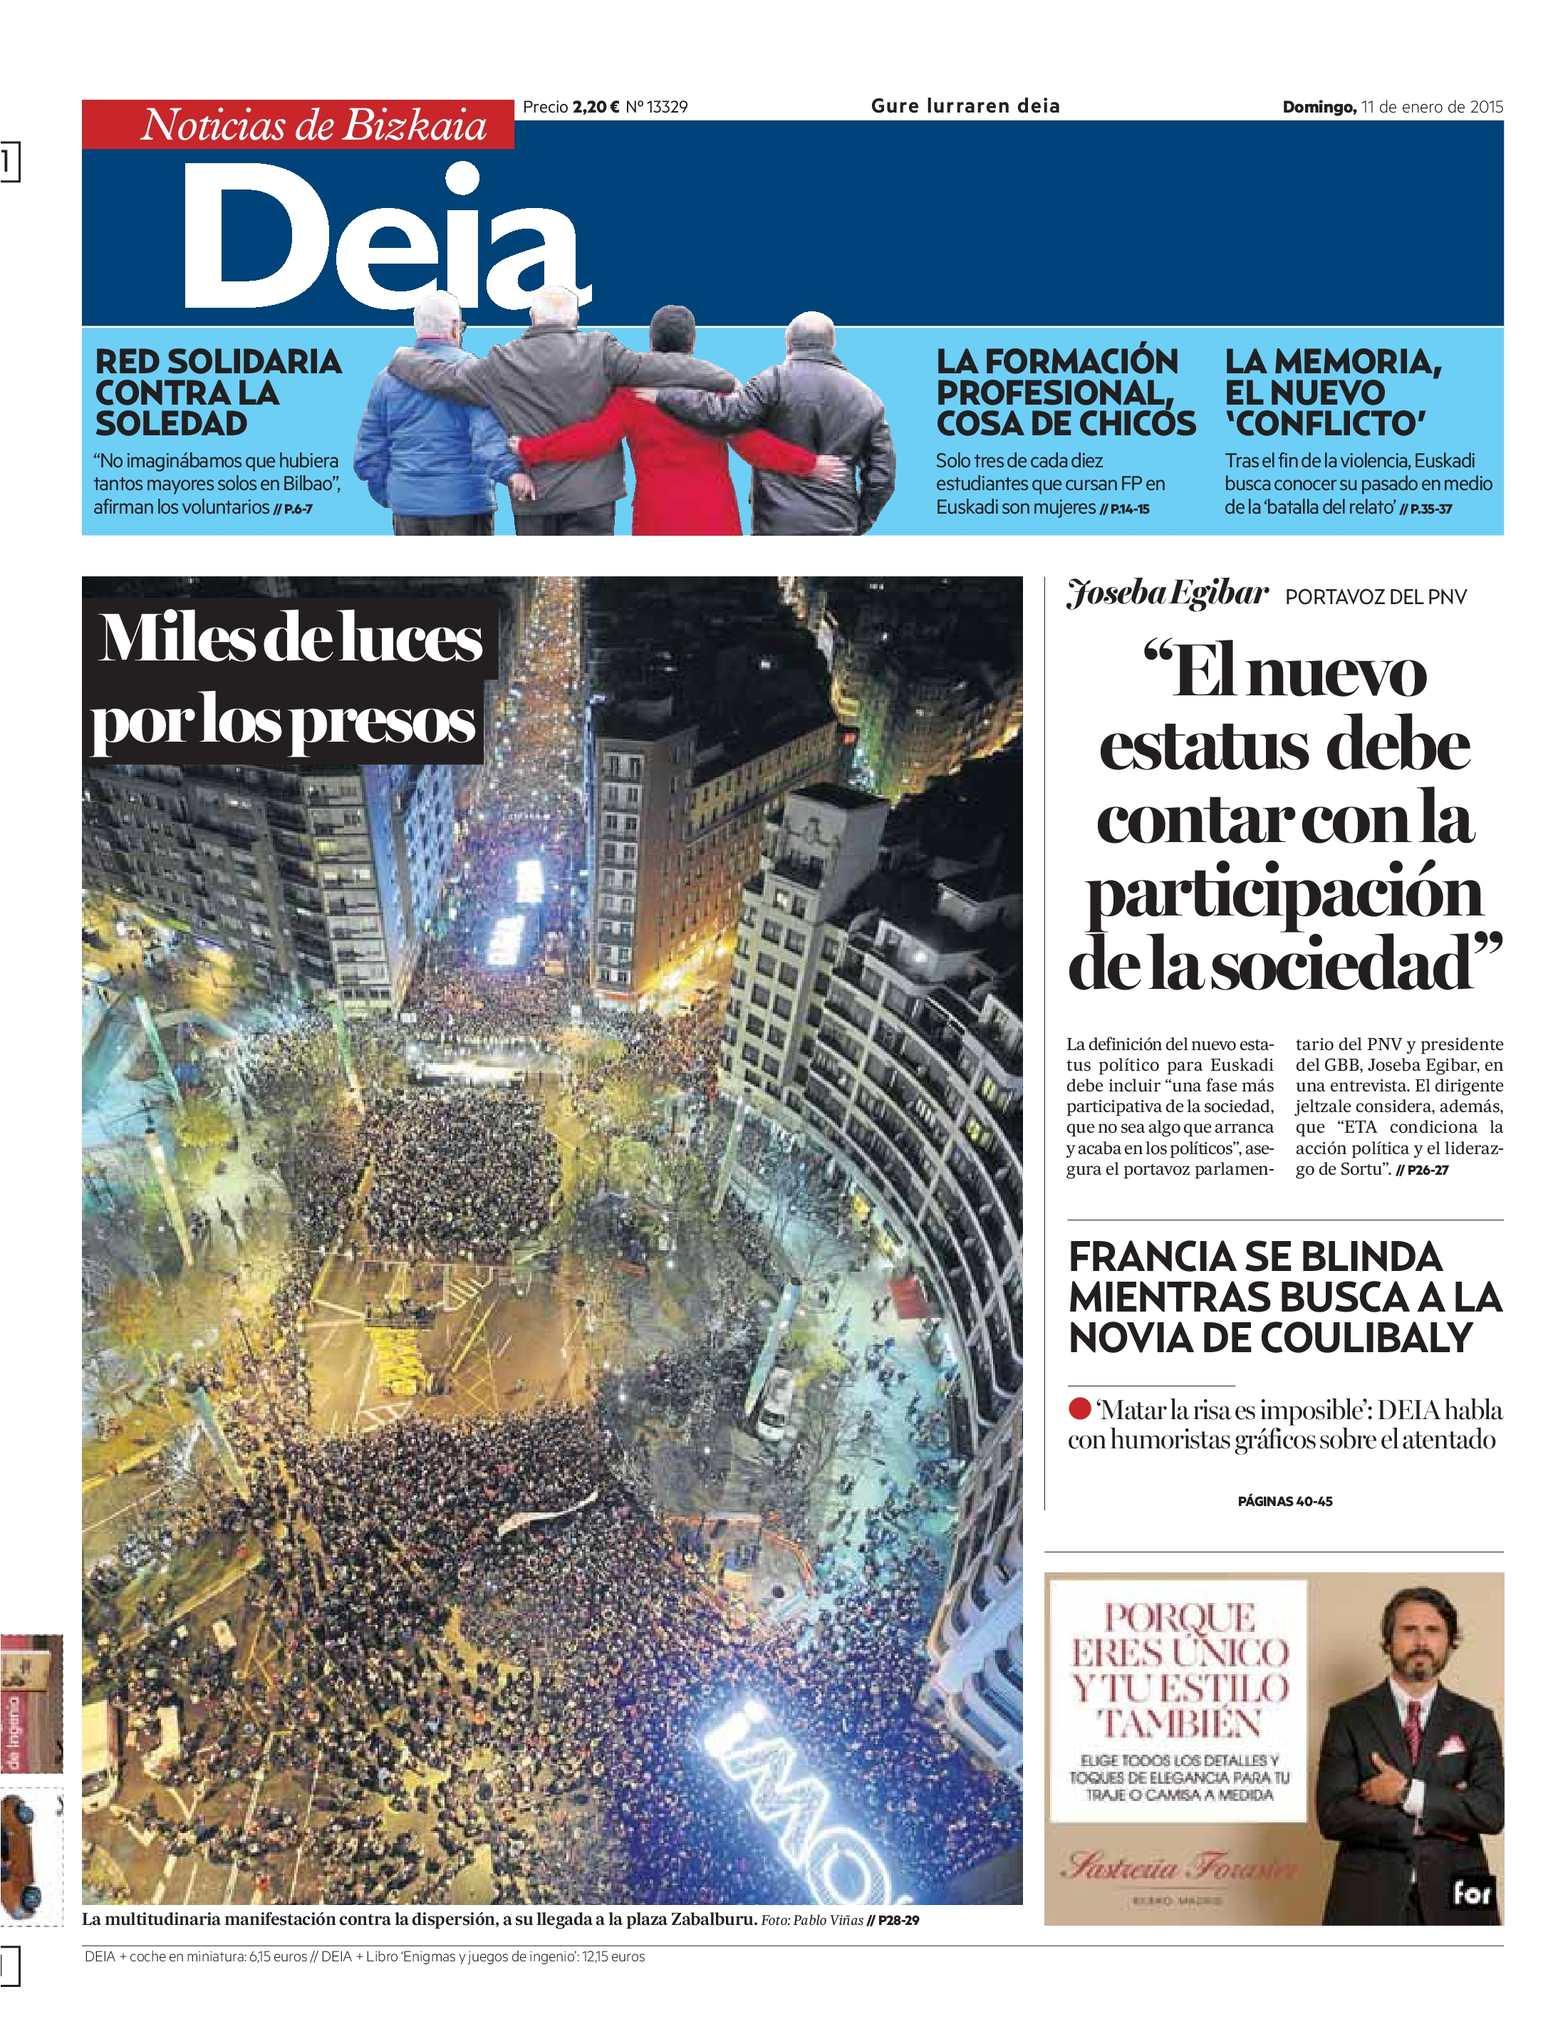 Calaméo - Deia 20150111